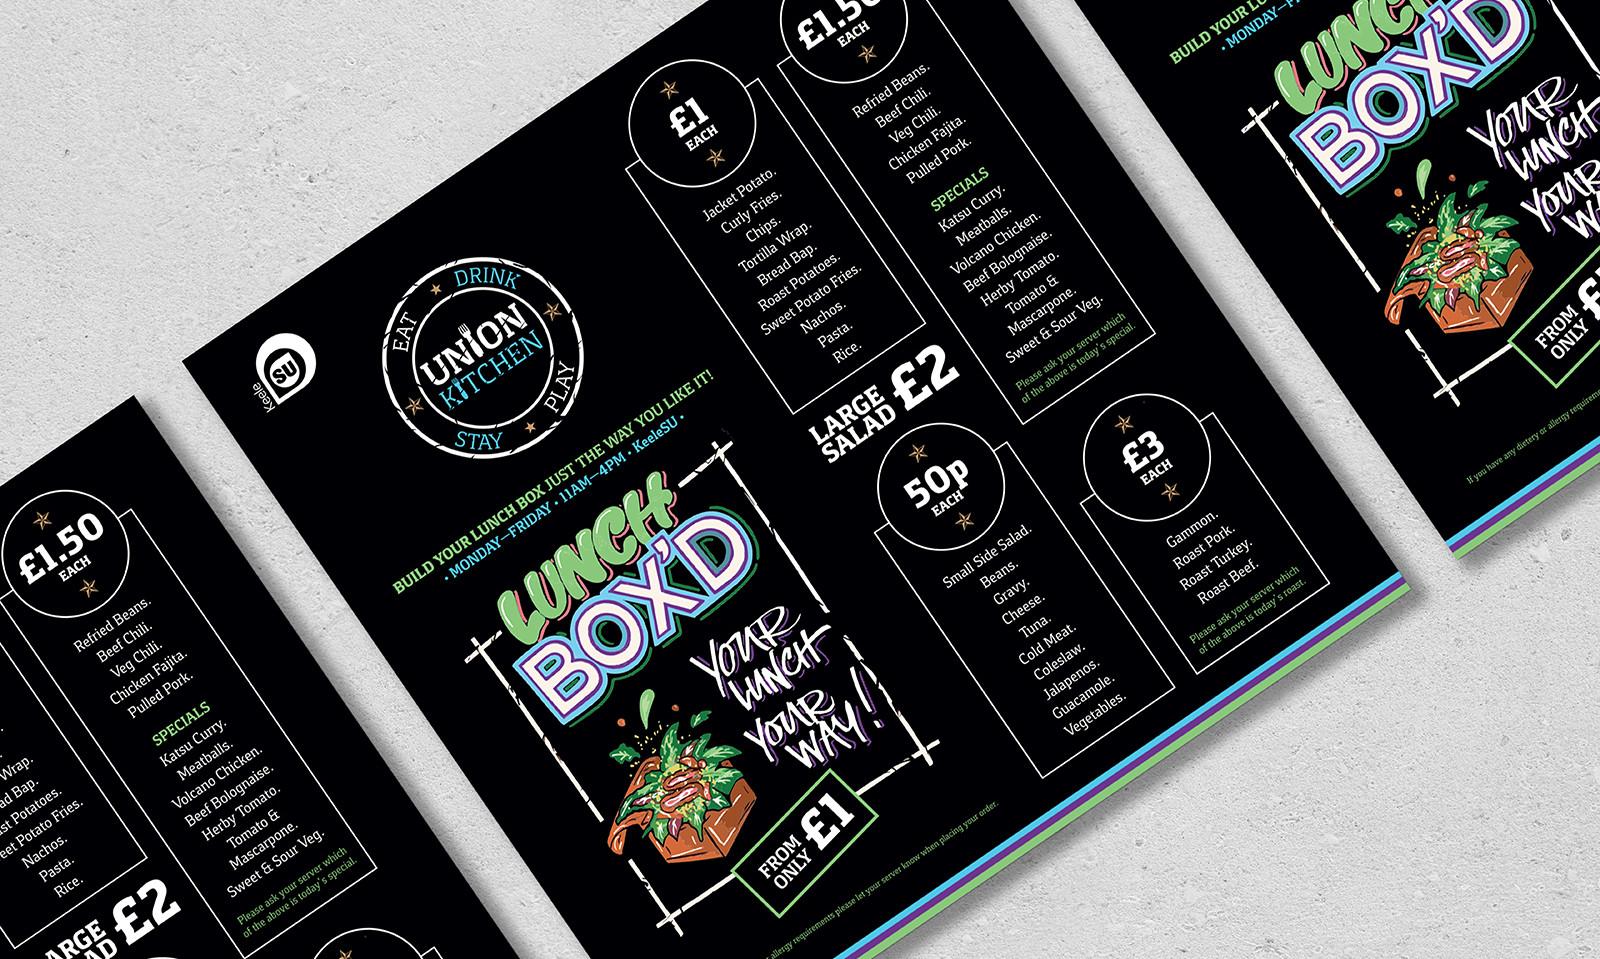 Union Kitchen - Lunch Box'd: Menu Insert